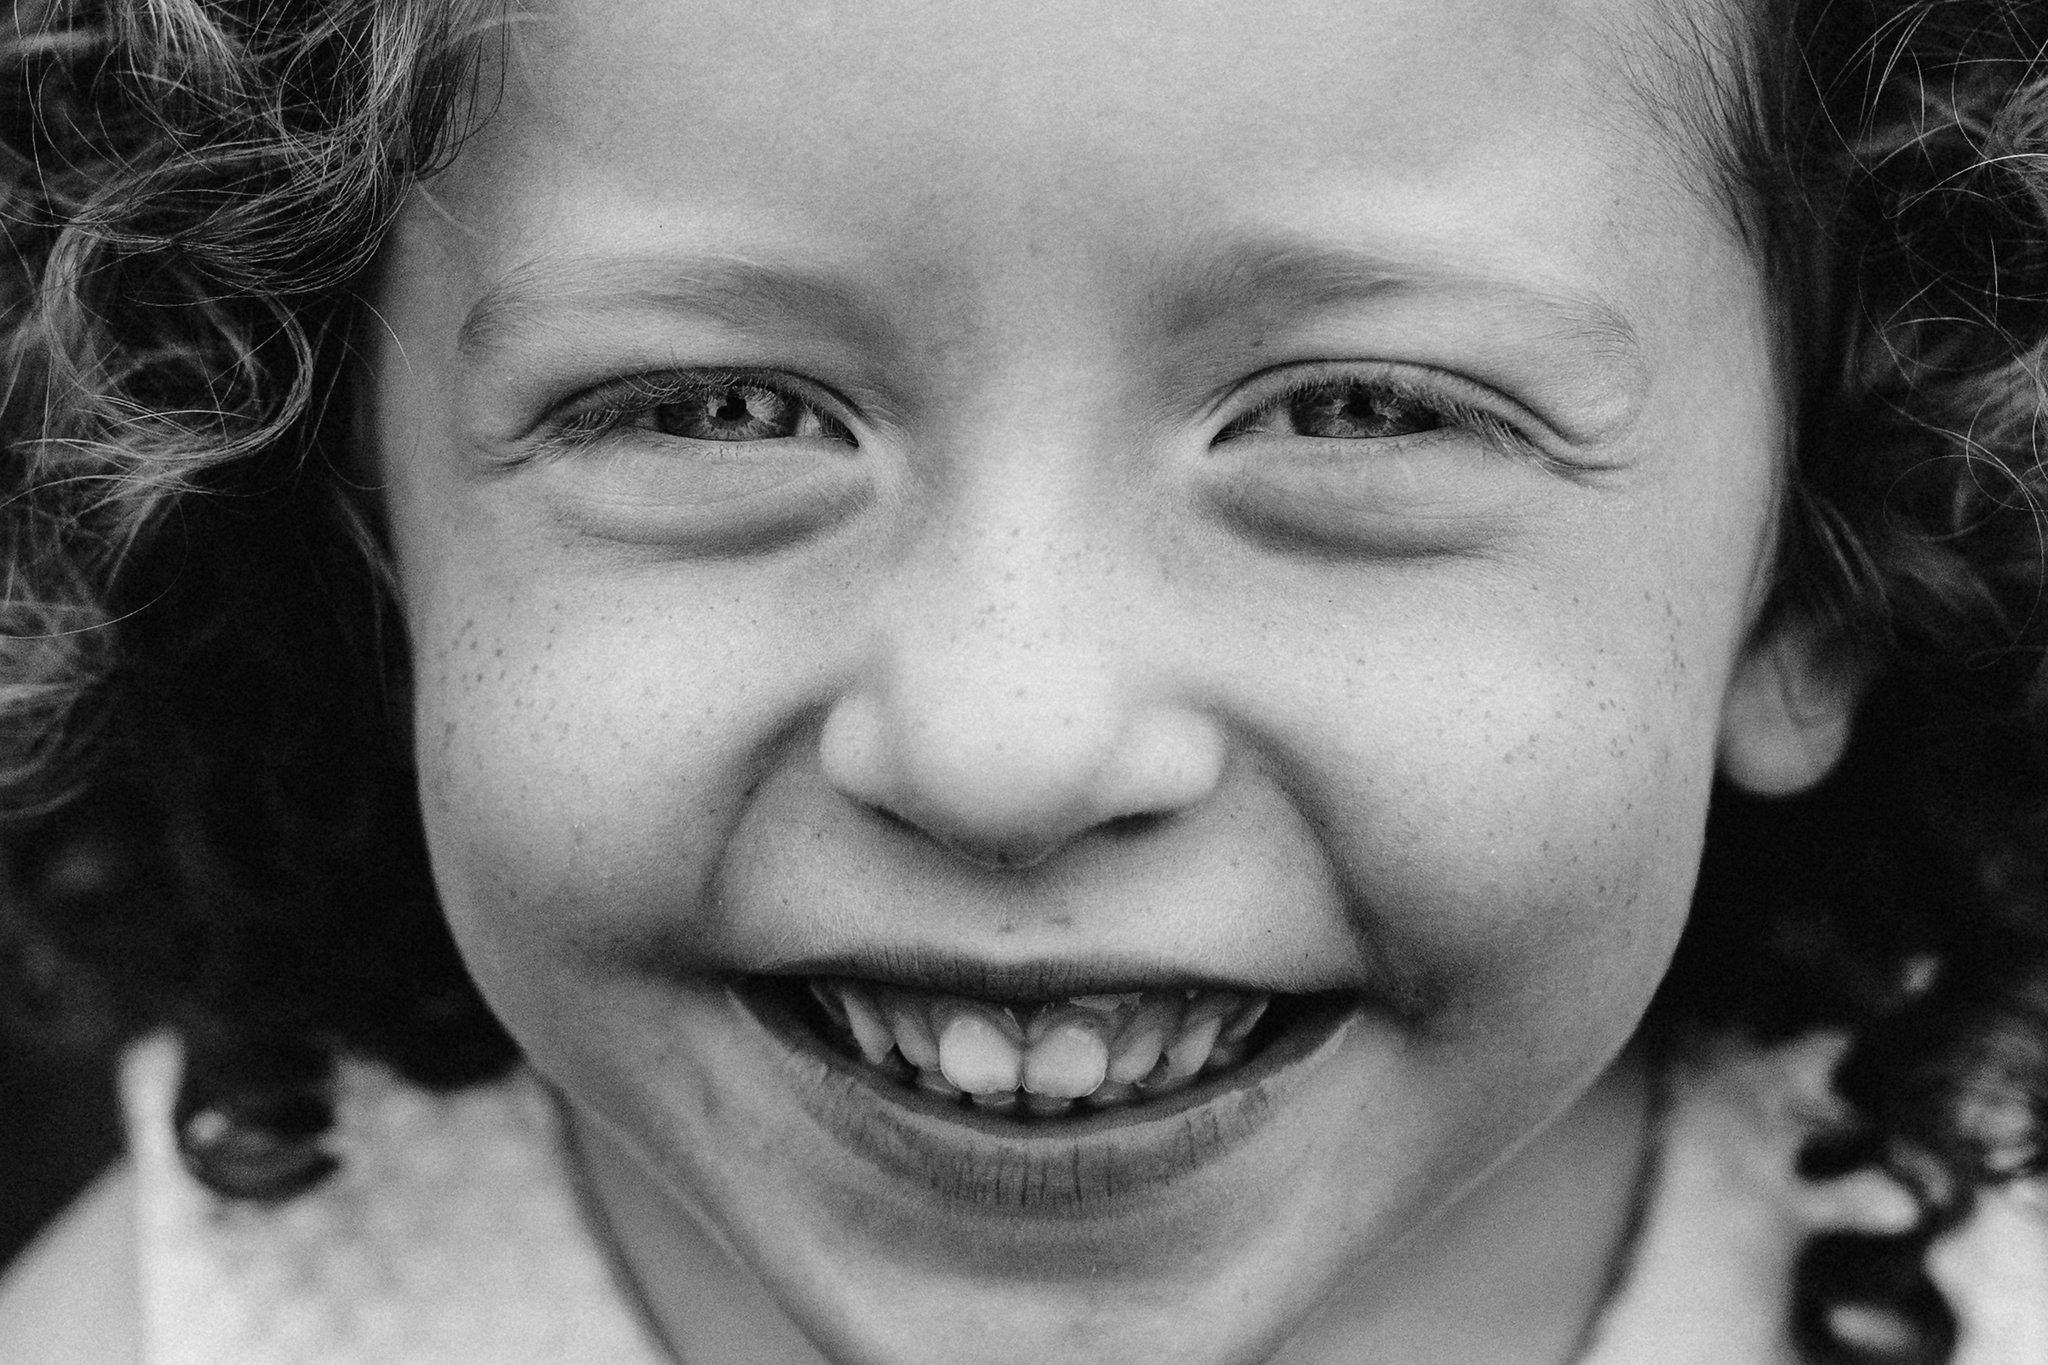 freckles-002.jpg